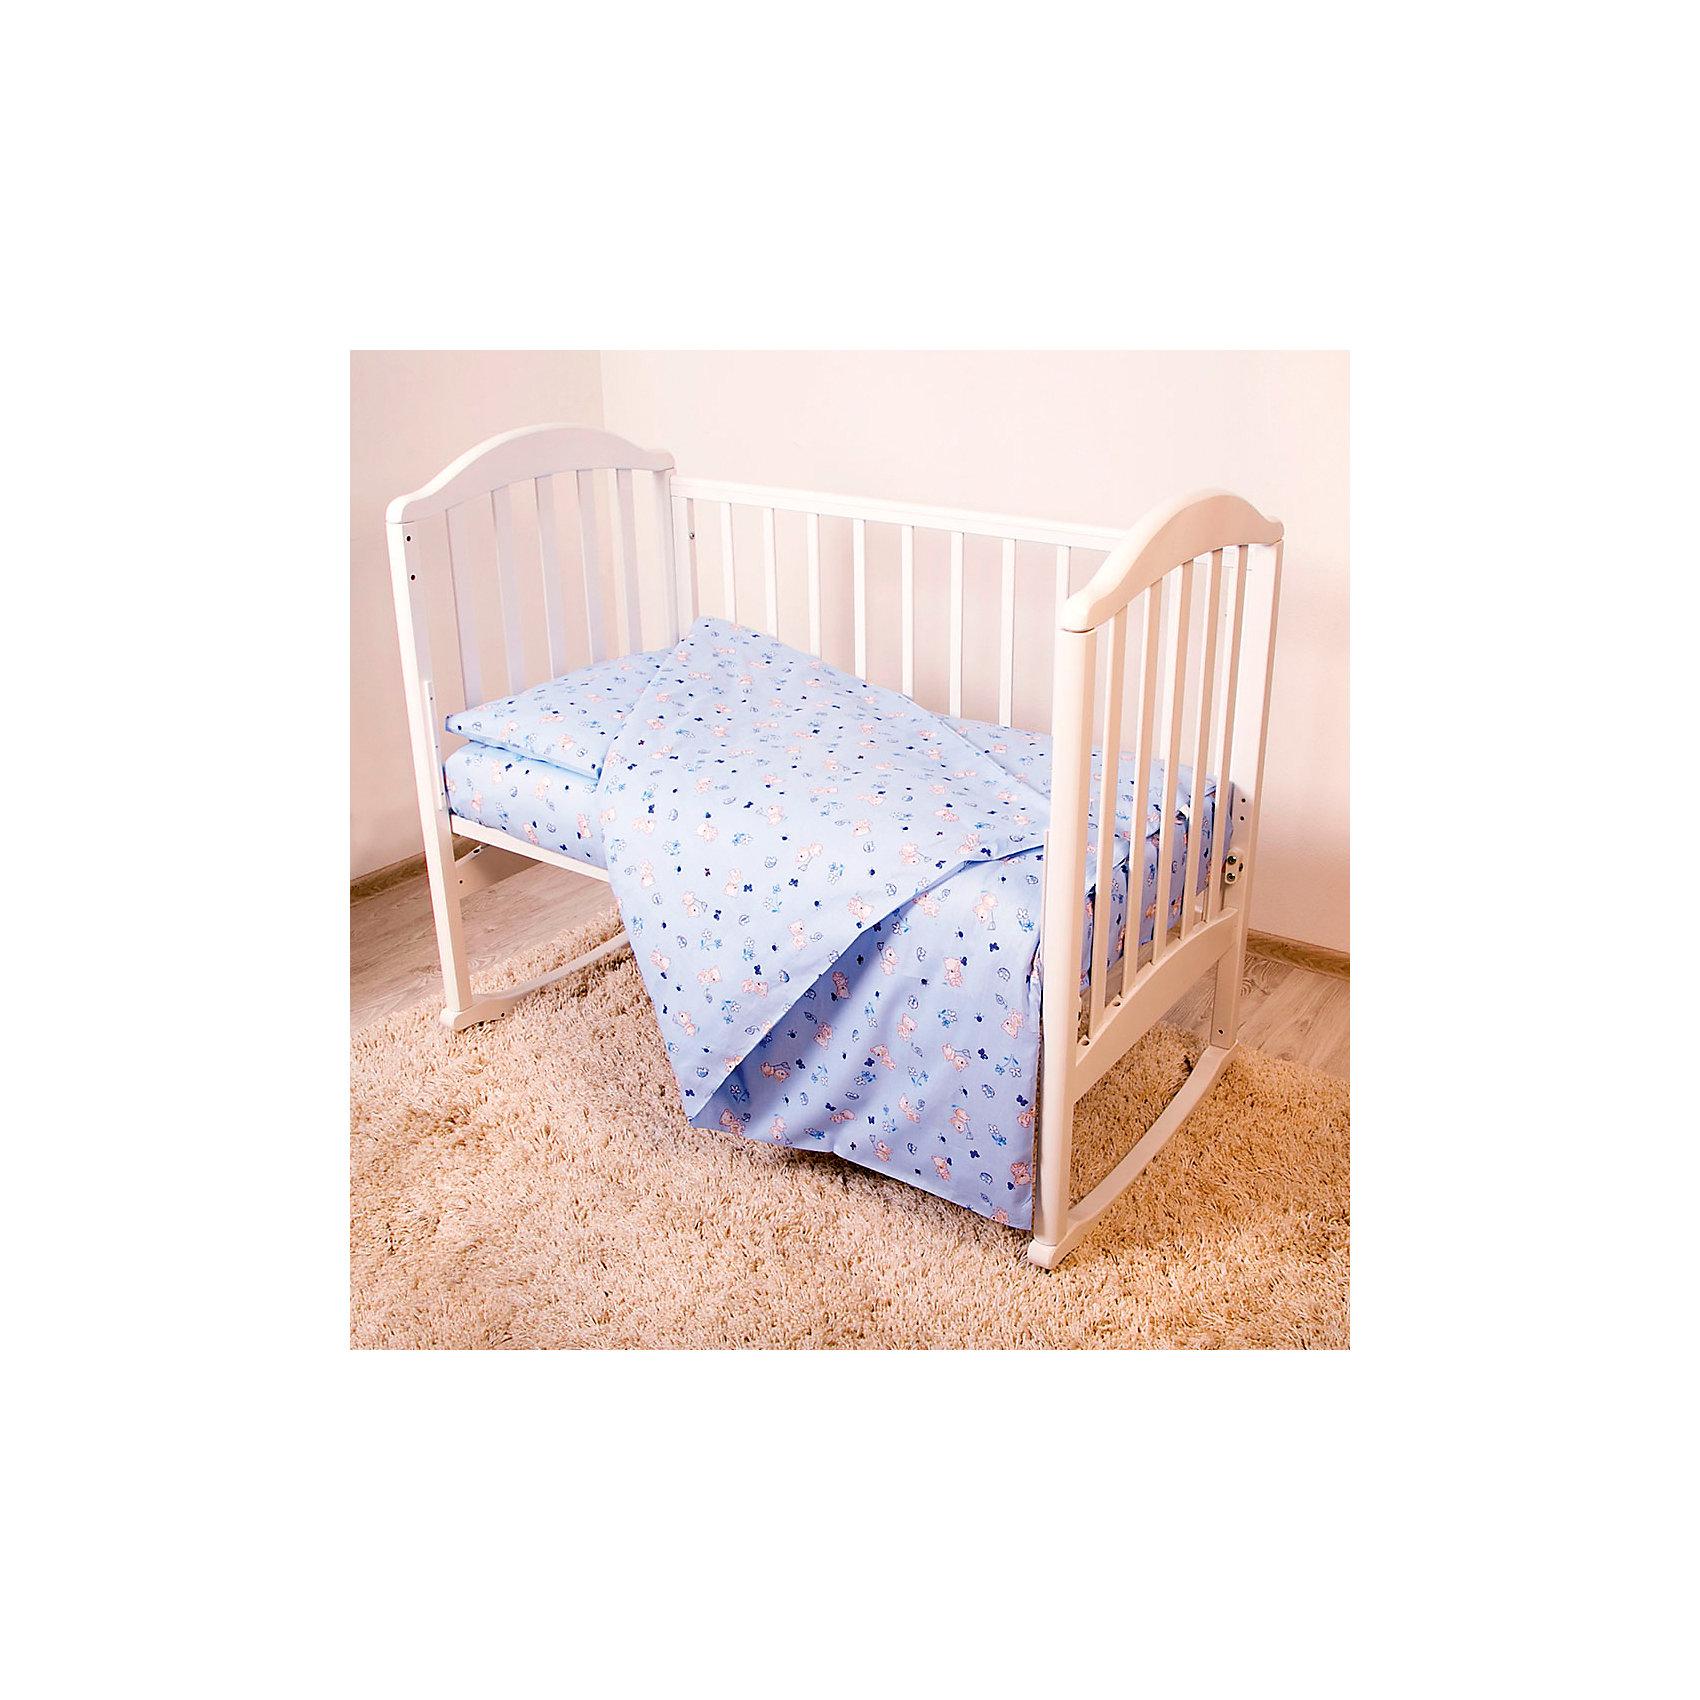 Baby Nice Постельное белье Мишки 3 пред., бязь 60х120, Baby Nice,голубой baby nice бортик мишки бязь baby nice розовый